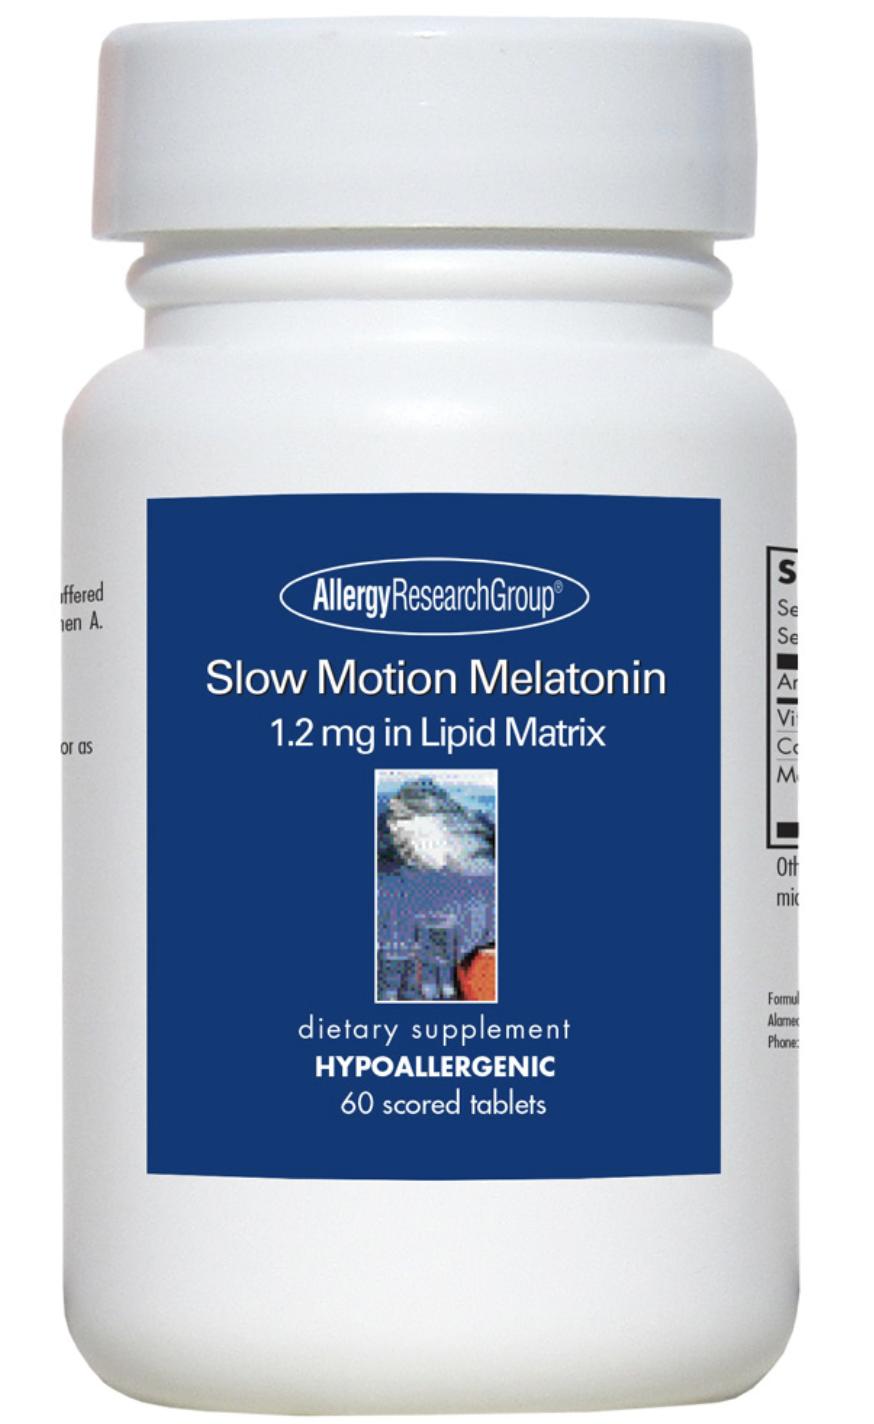 Slow Motion Melatonin 1.2 mg in Lipid Matrix 60 Scored Tablets Allergy Research Group